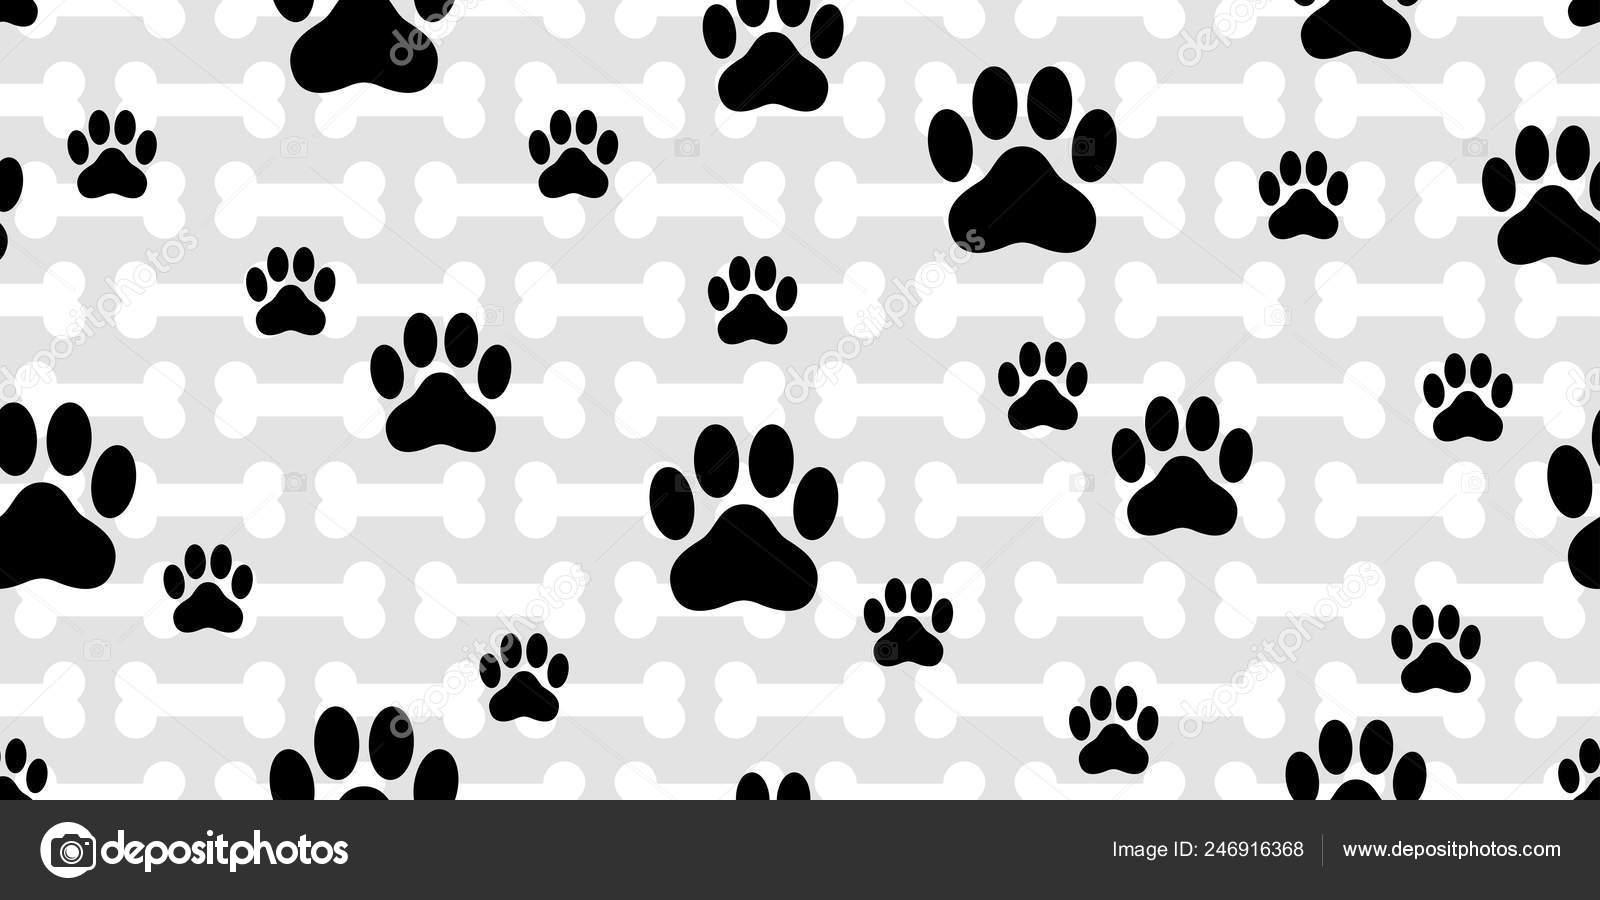 Dog Paw Seamless Pattern Vector French Bulldog Bone Footprint Cartoon Stock Vector C Cnuisin 246916368